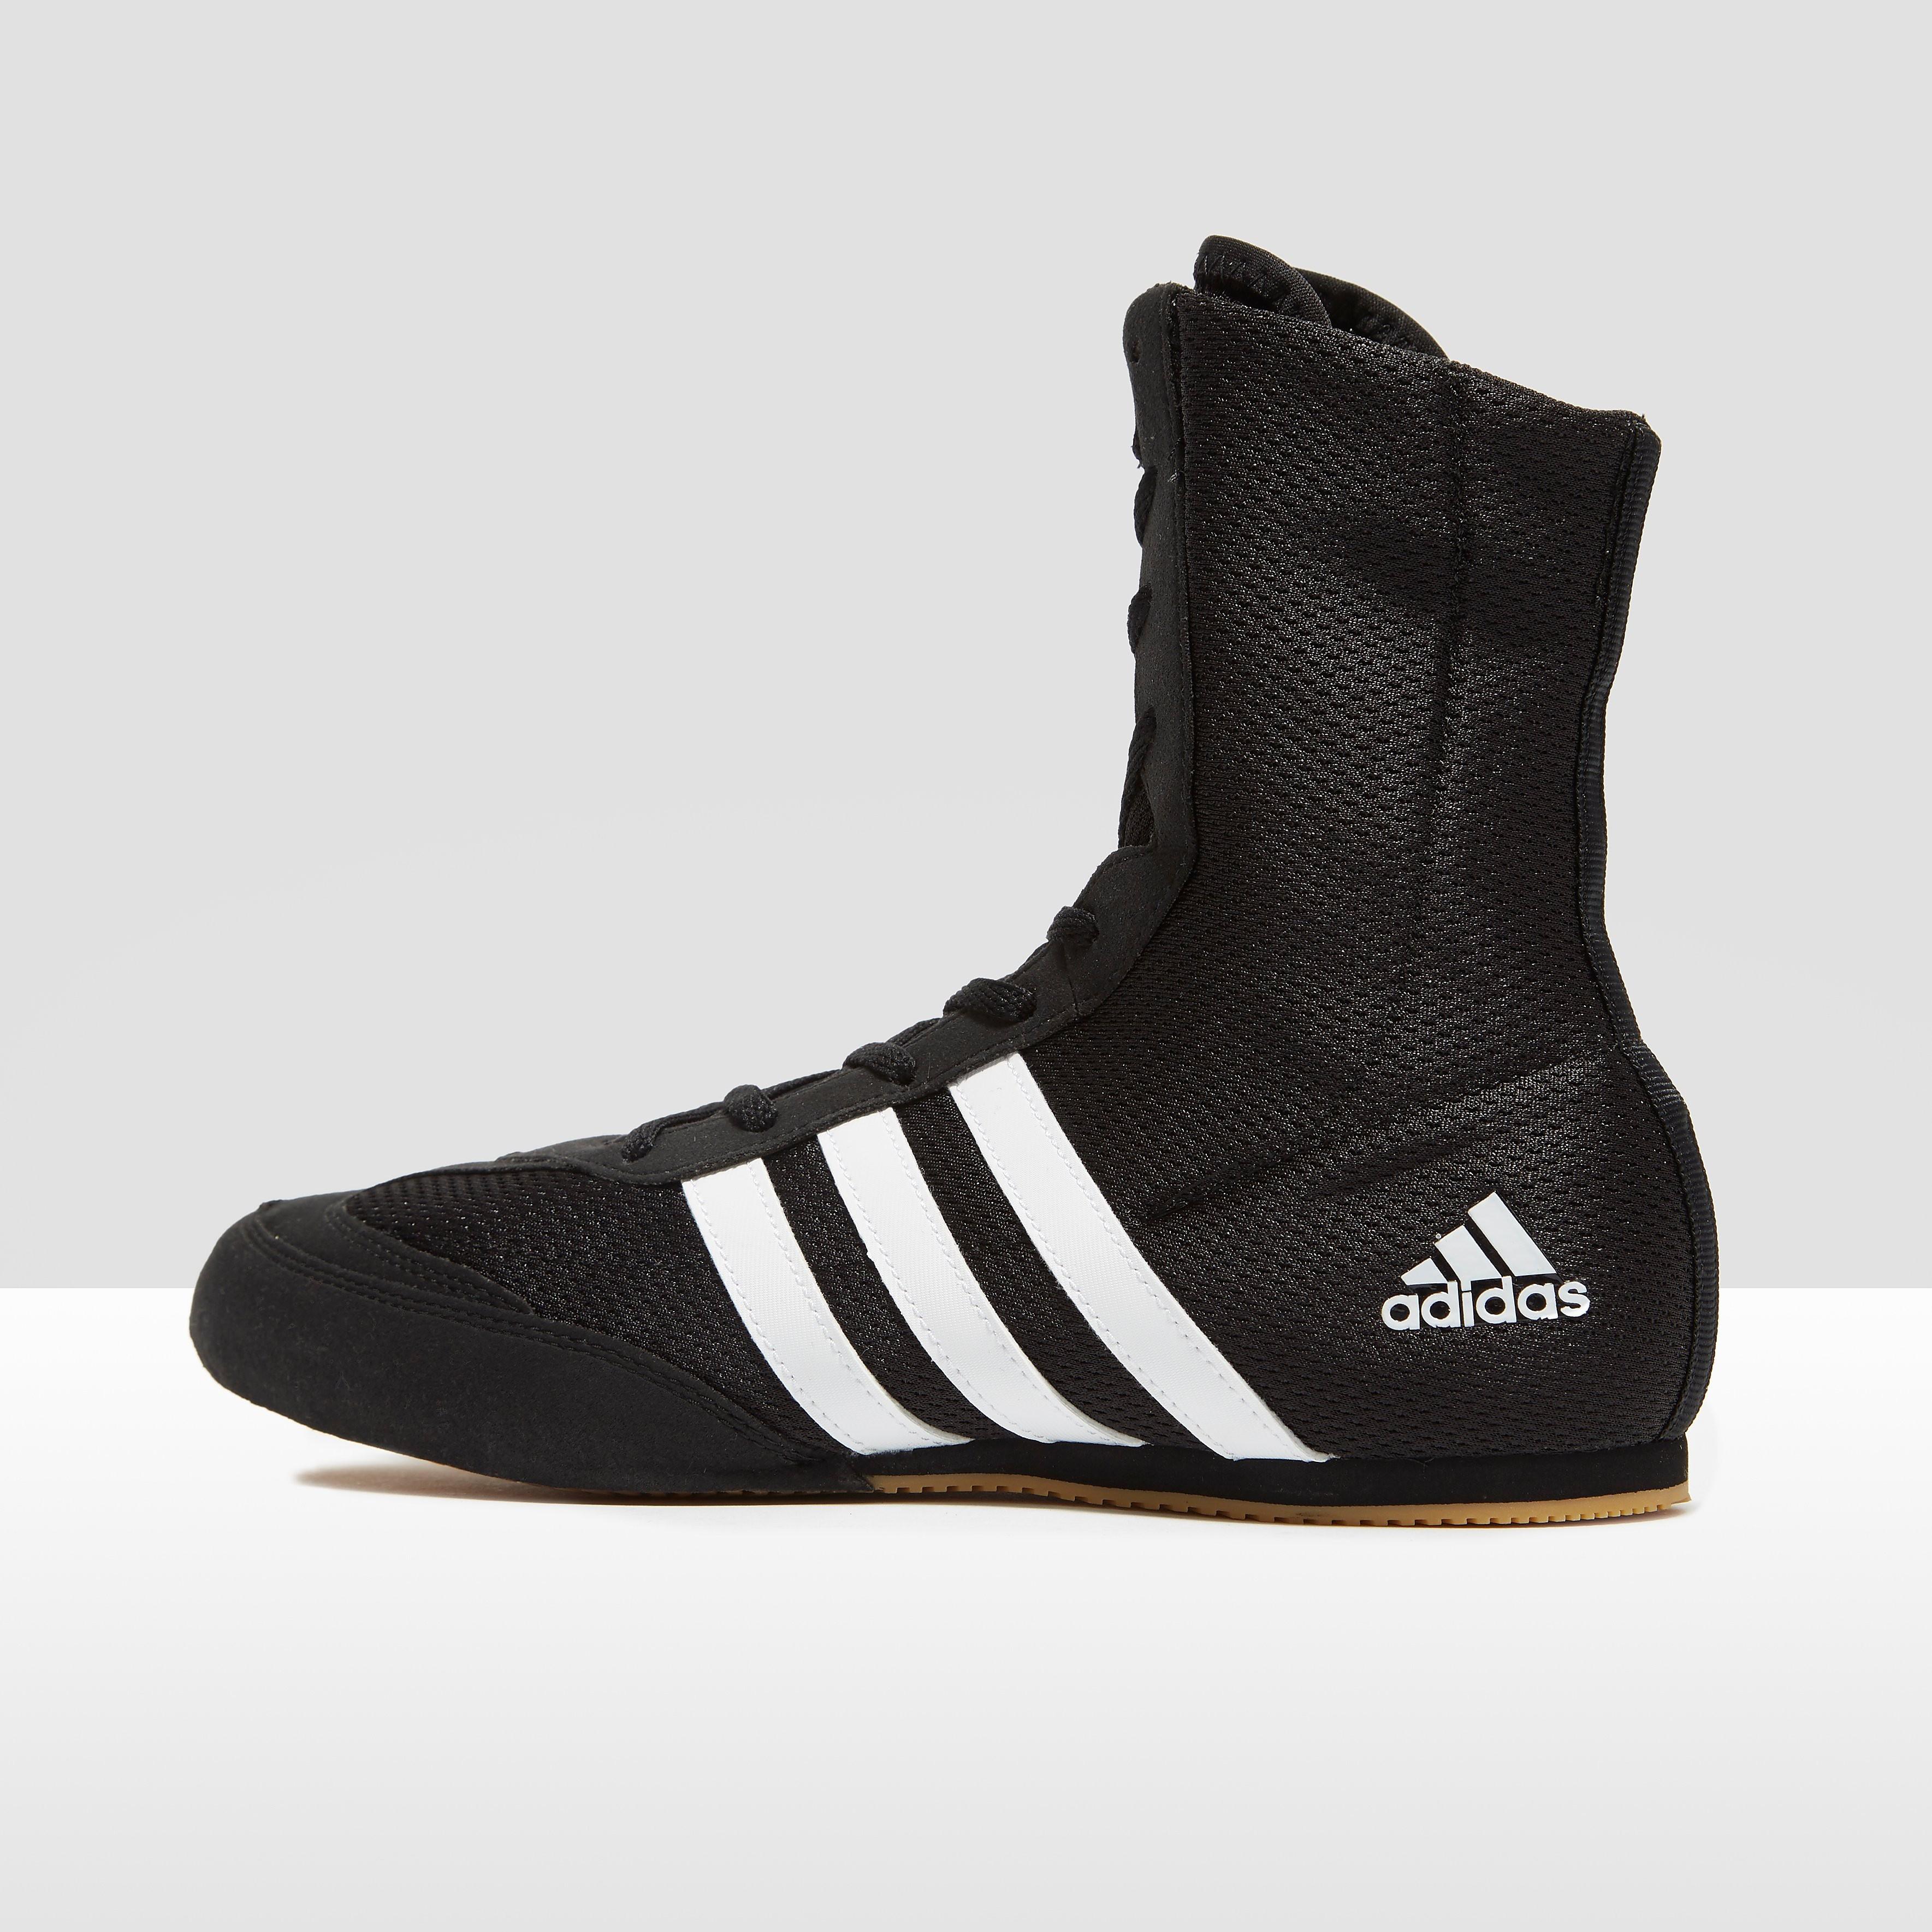 adidas Box Hog 2 Adult Boxing Boot